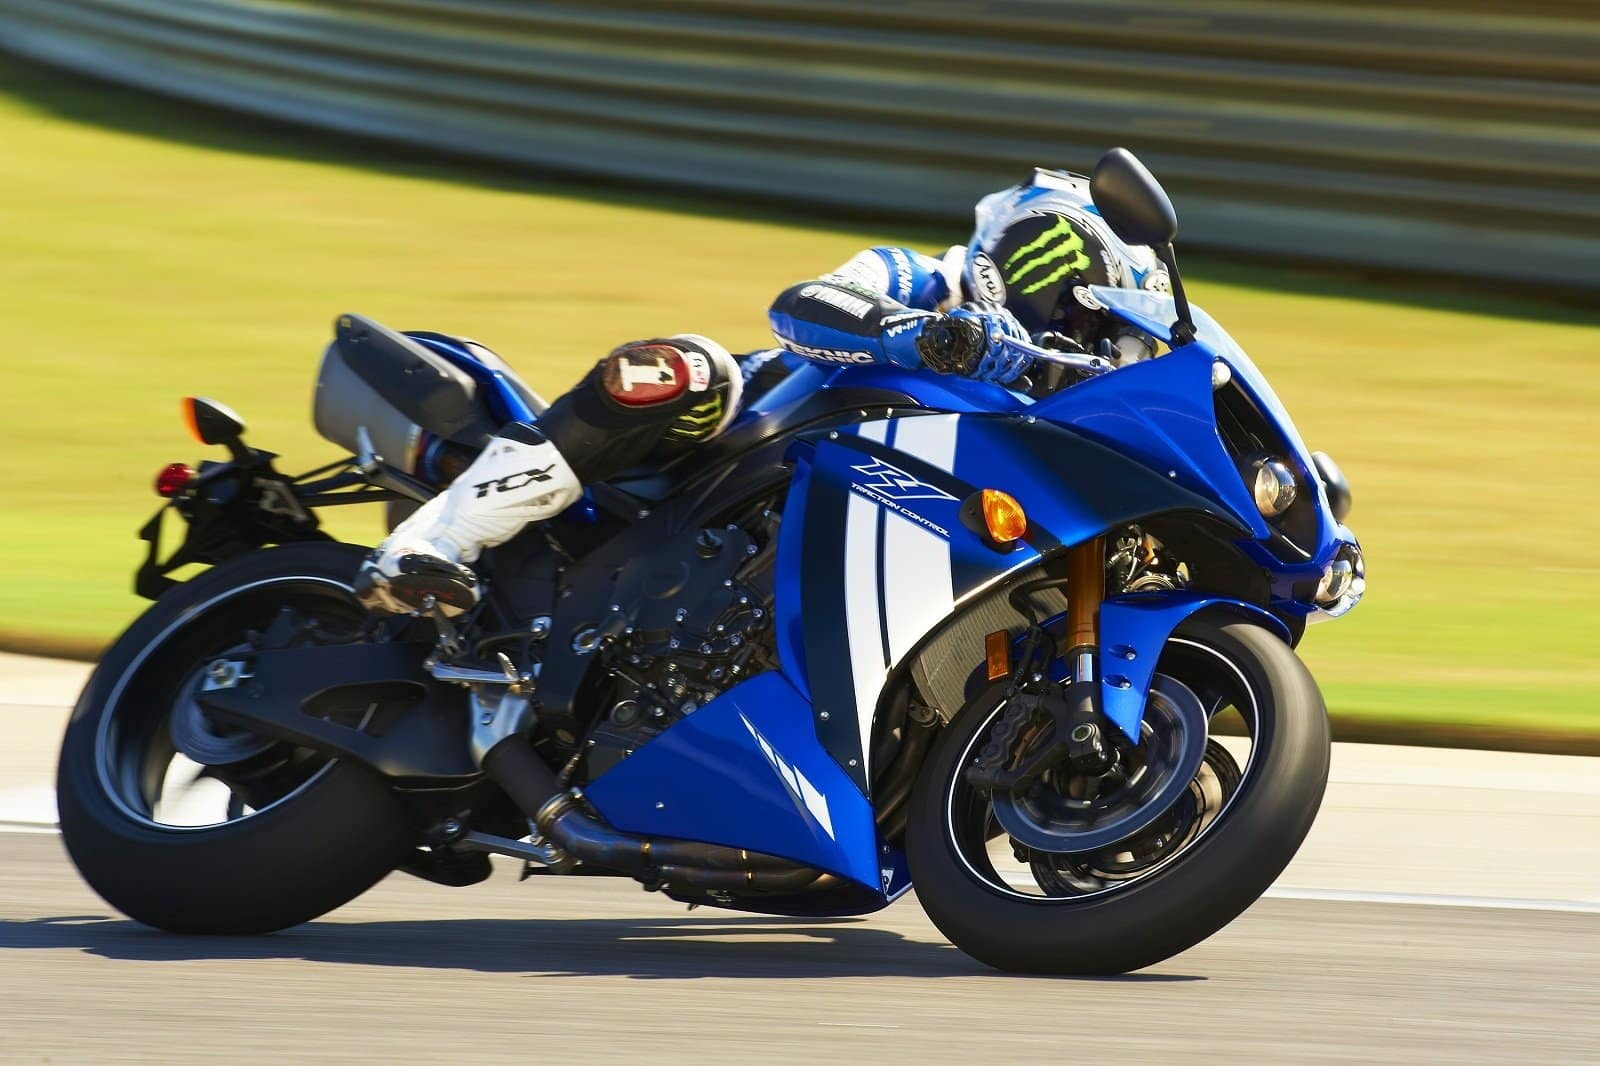 2012 blue yamaha r1 action shot leaned over on track